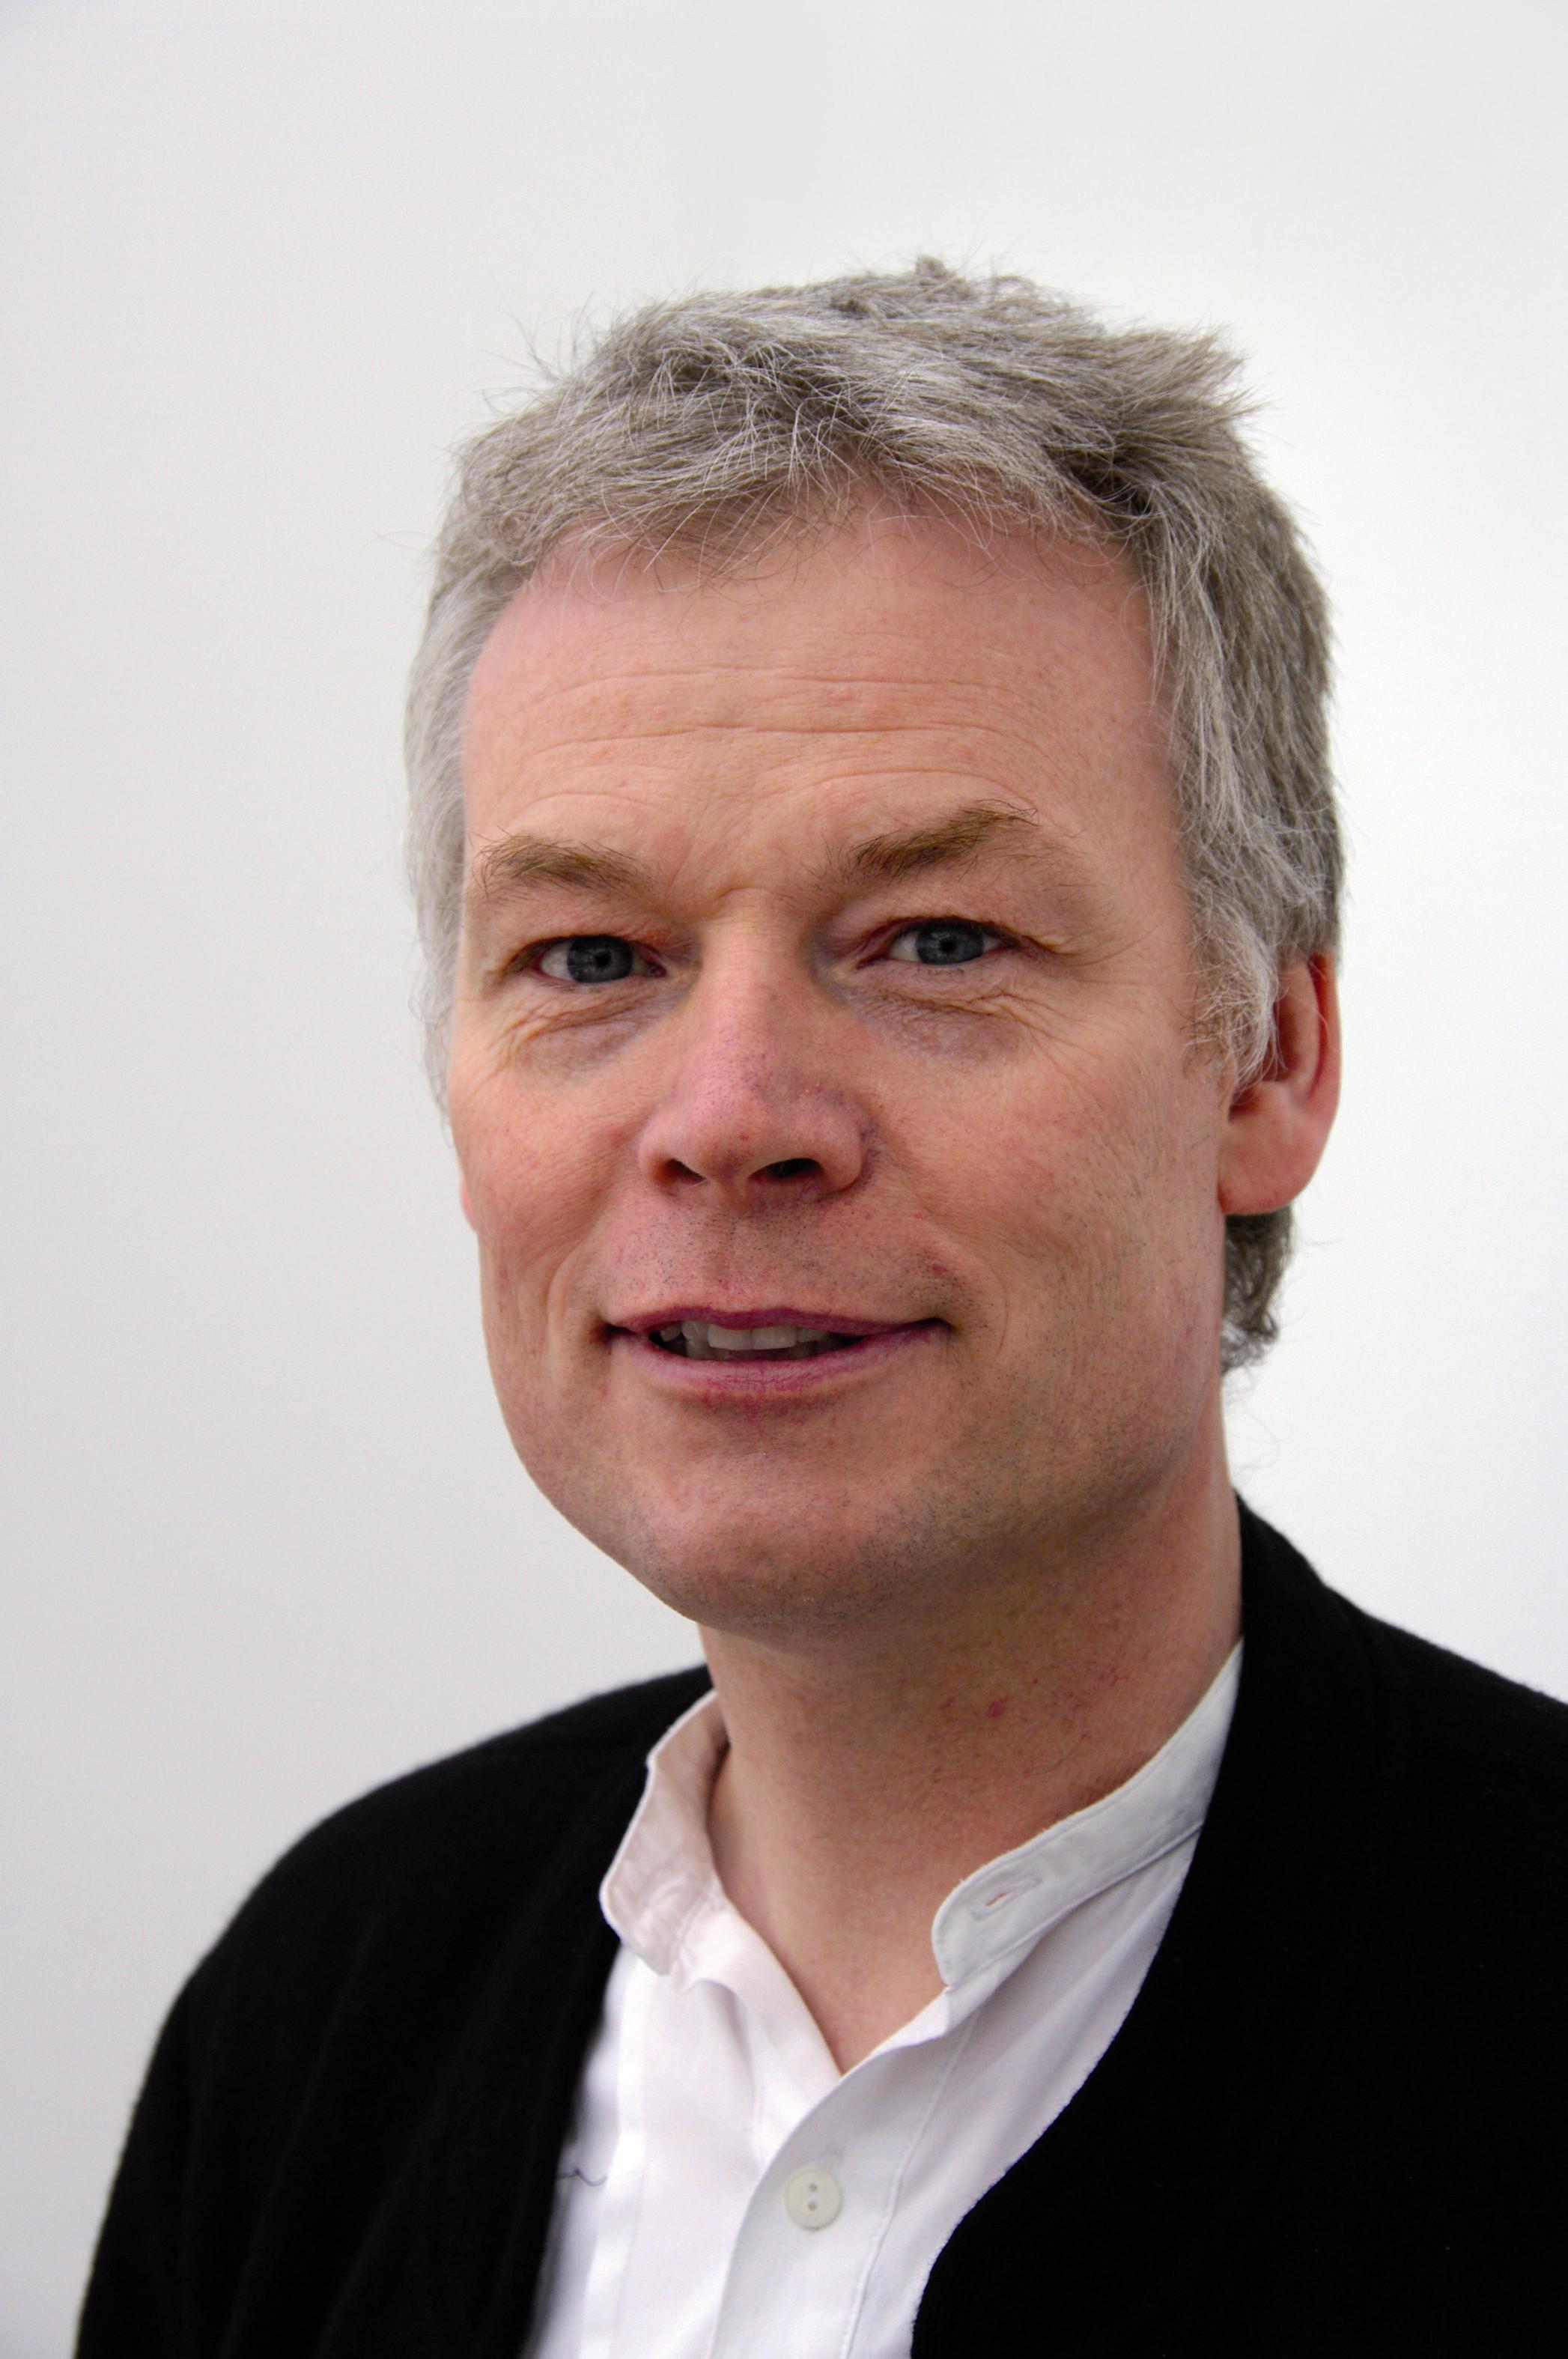 Gerrit Horn